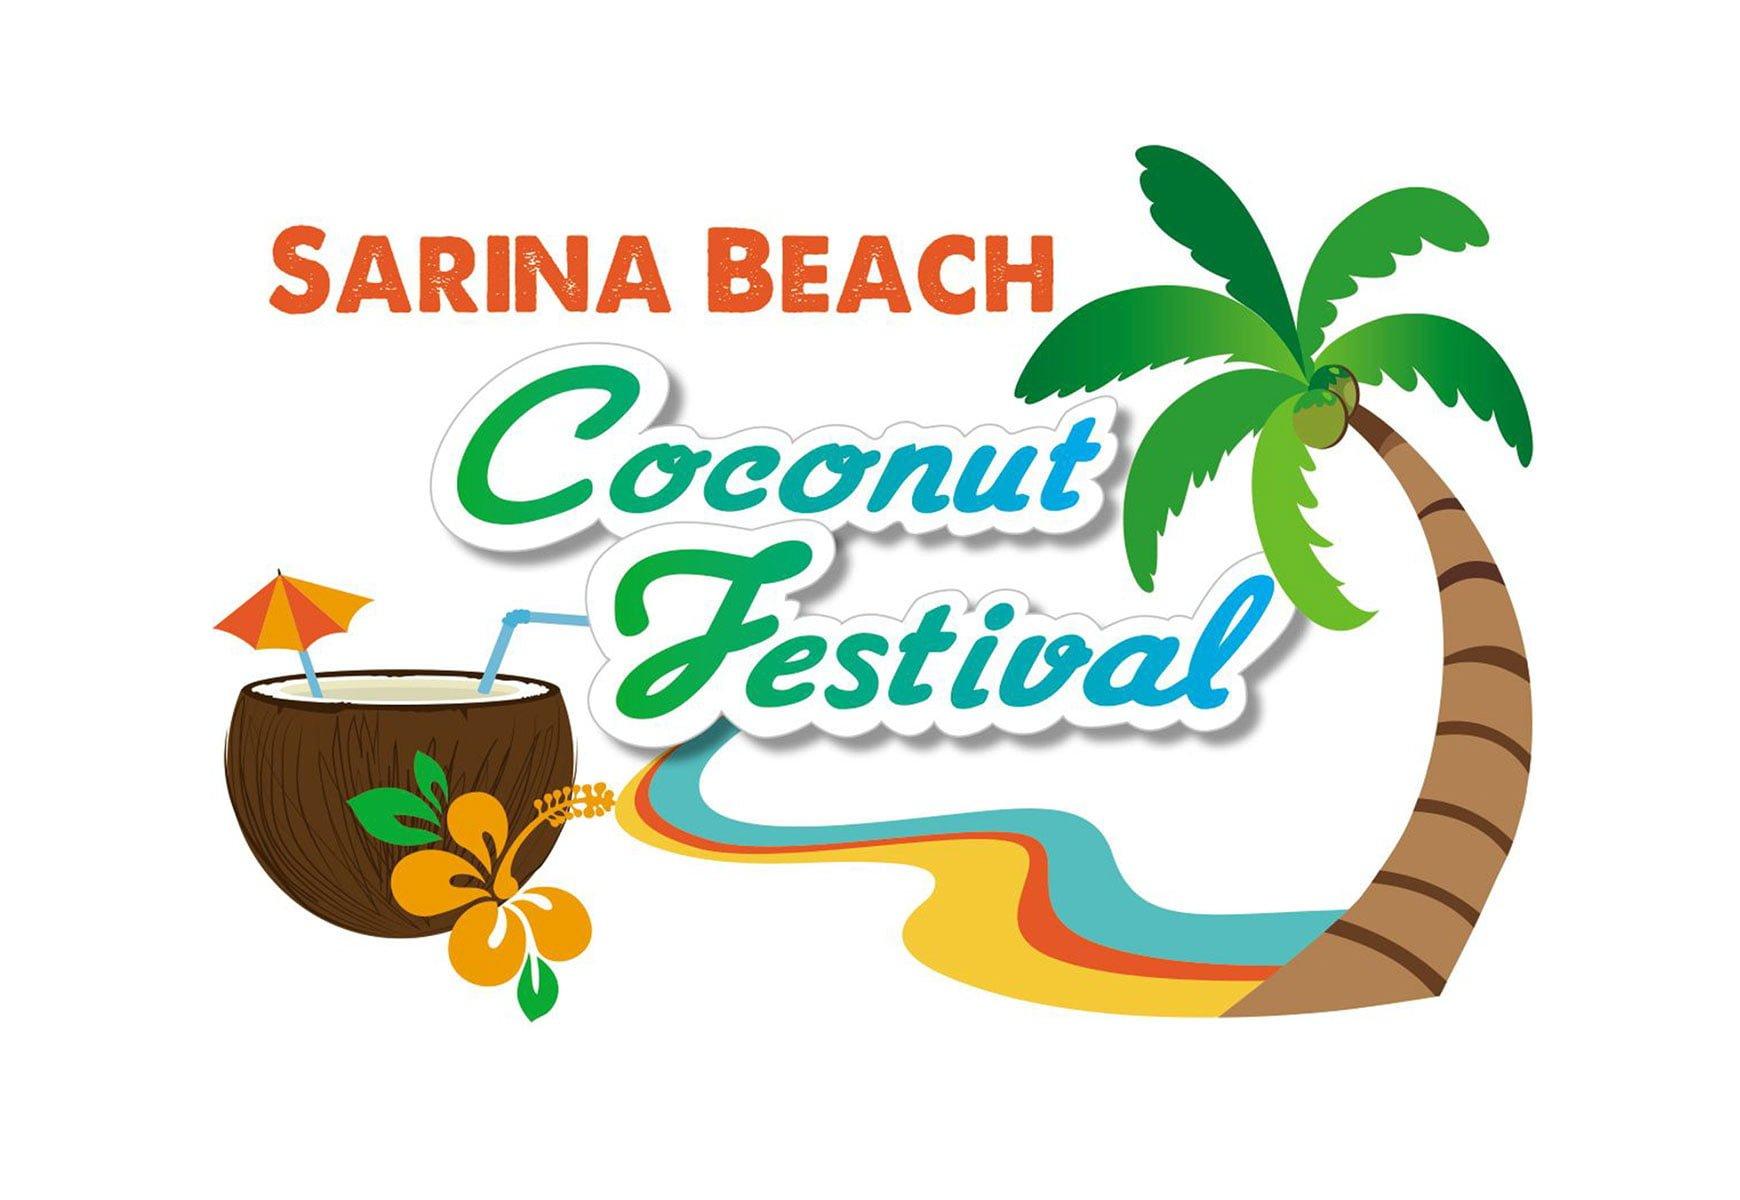 Sarina Beach Coconut Festival Logo